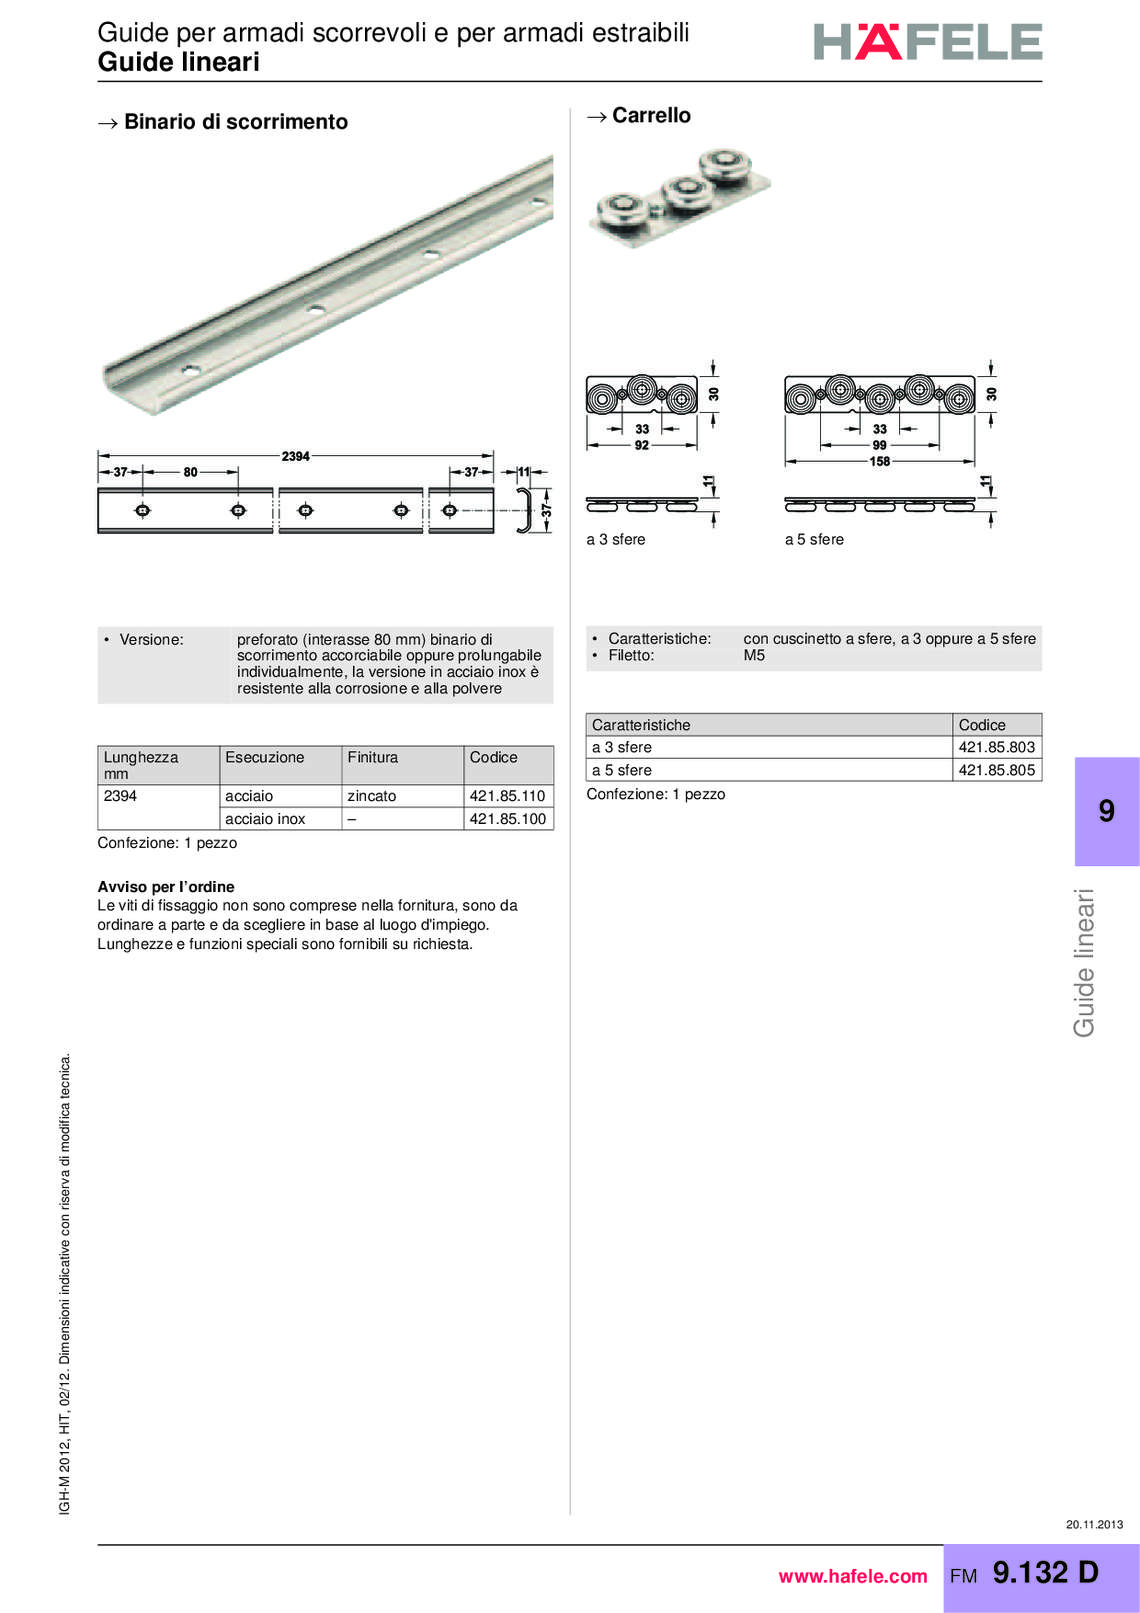 hafele-spondine-e-guide-per-mobili_40_188.jpg